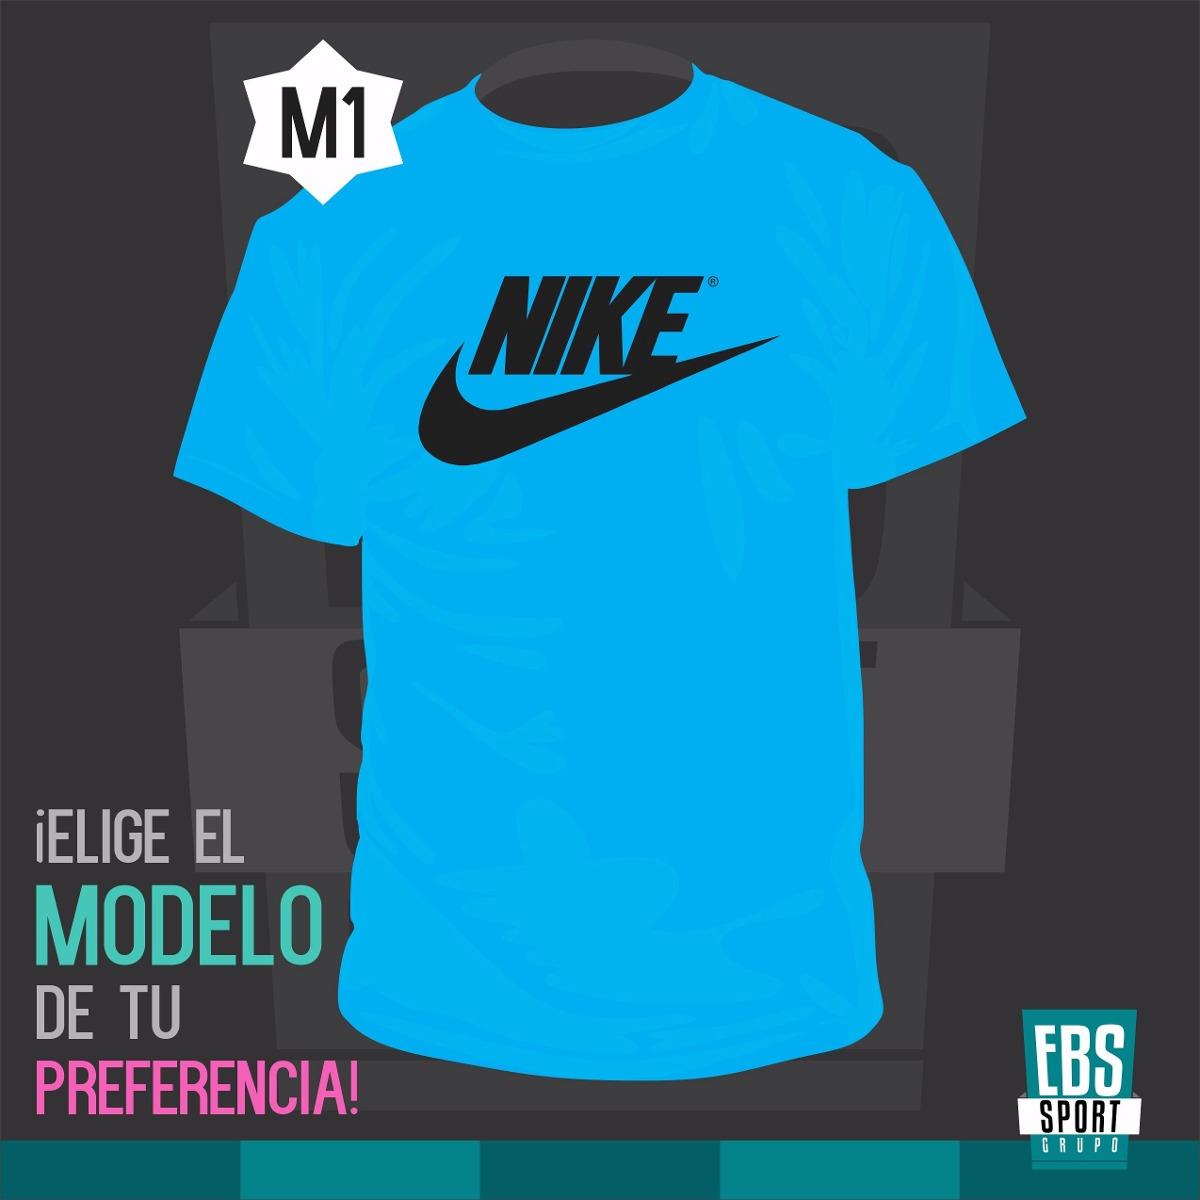 70e93af94a722 Camiseta Camisa Caballeros Nike adidas Under Armour -   30.000 en ...